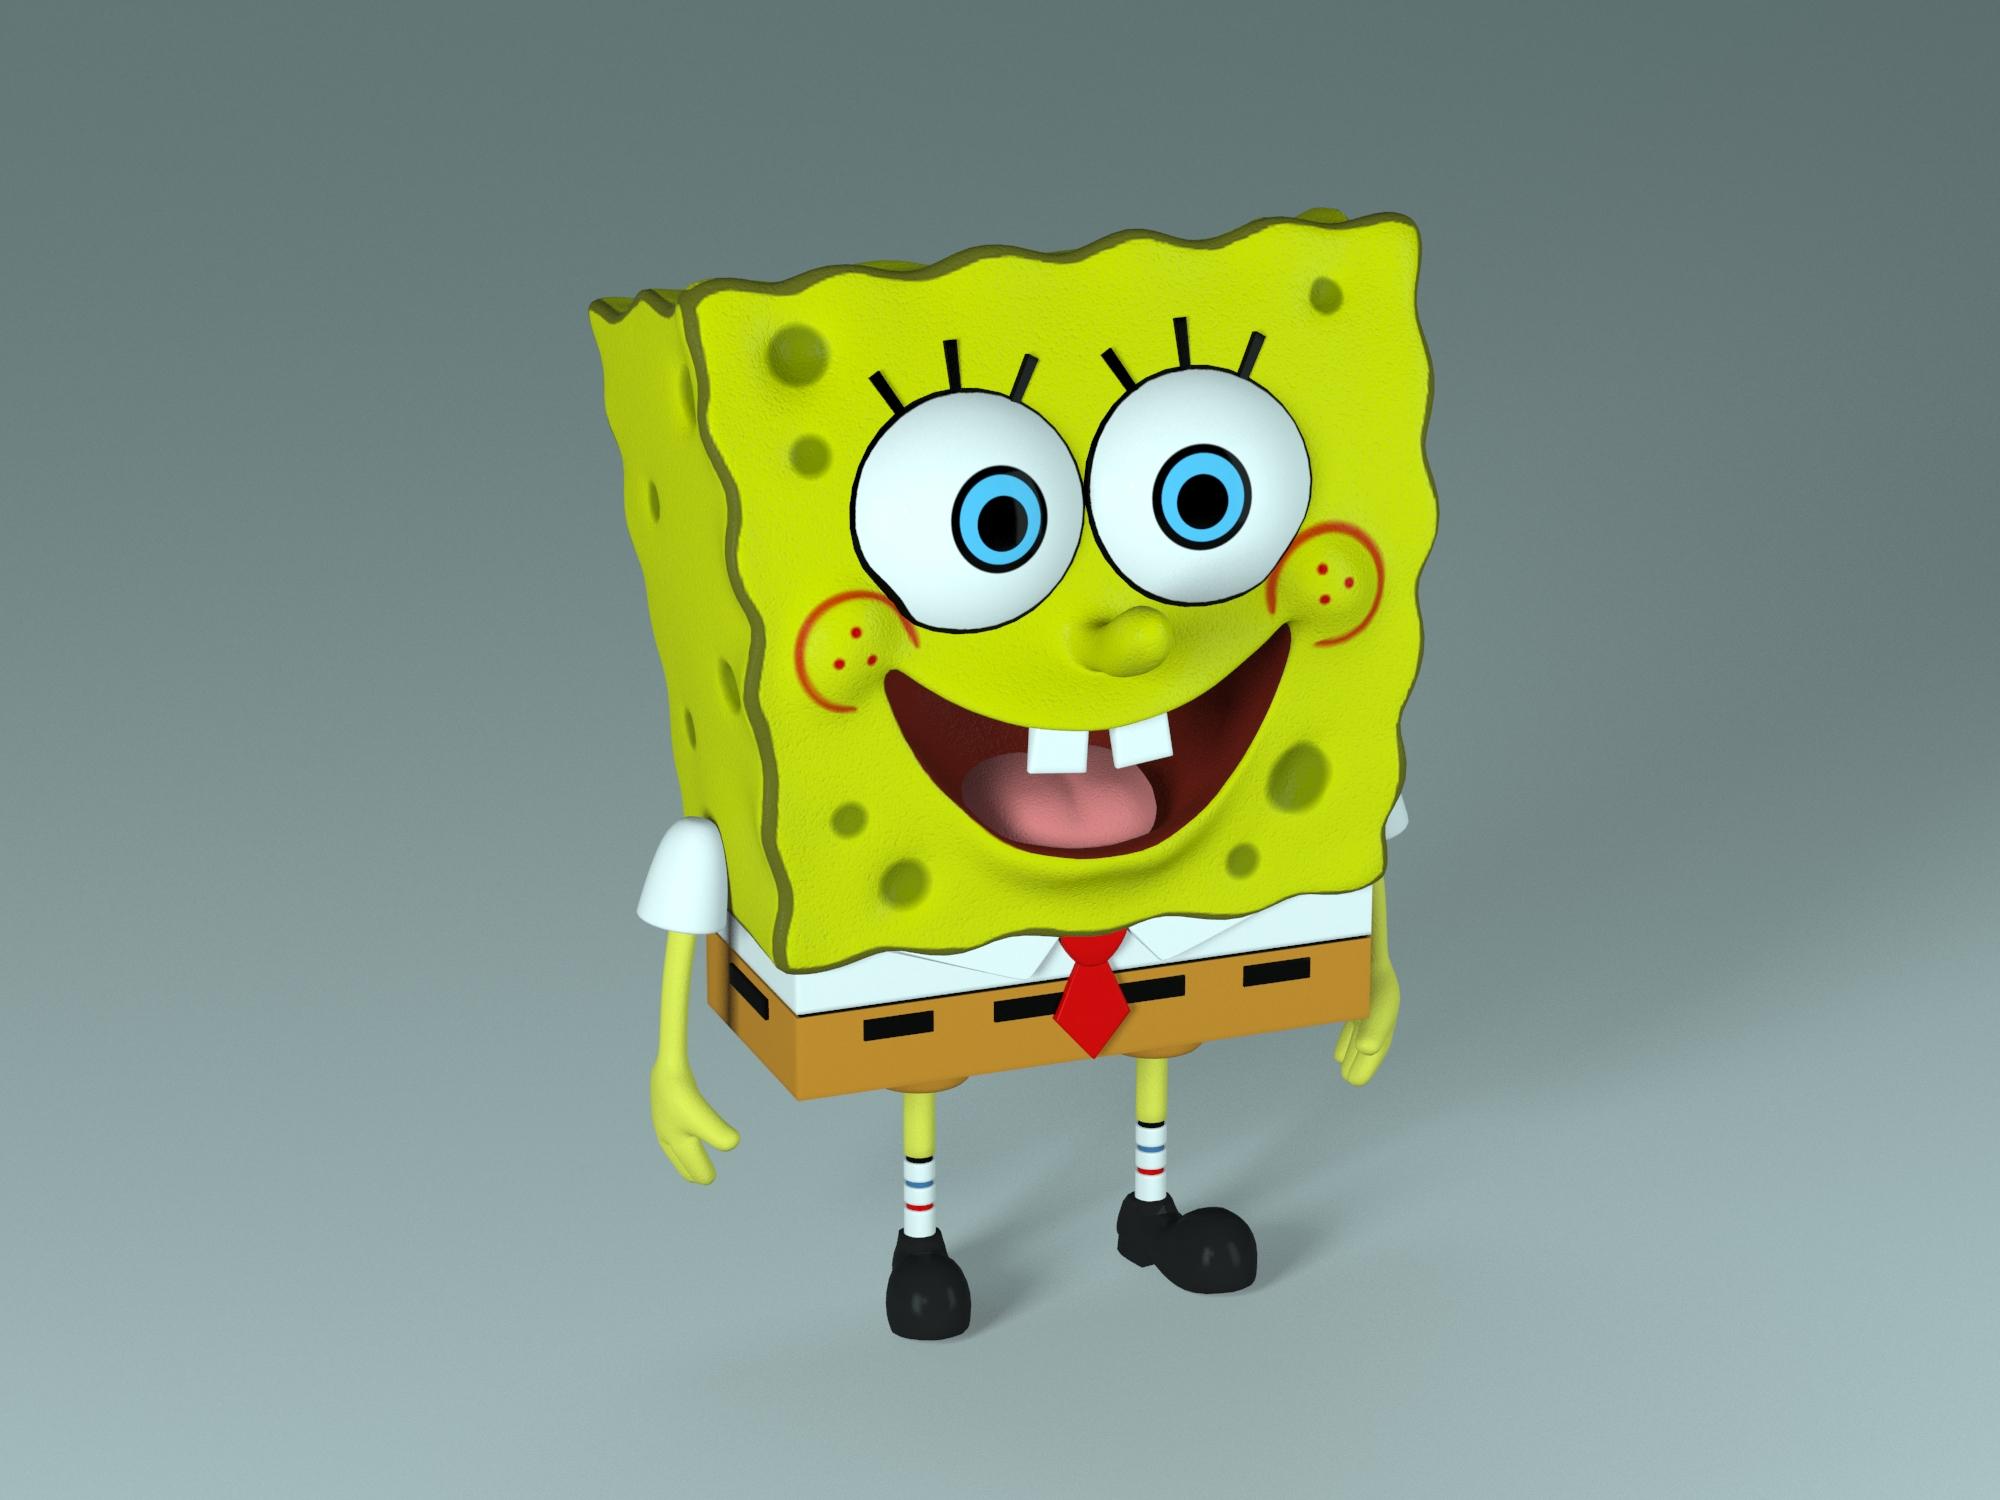 spongebob - bob esponja 3d líkan max fbx c4d lxo áferð obj 270432